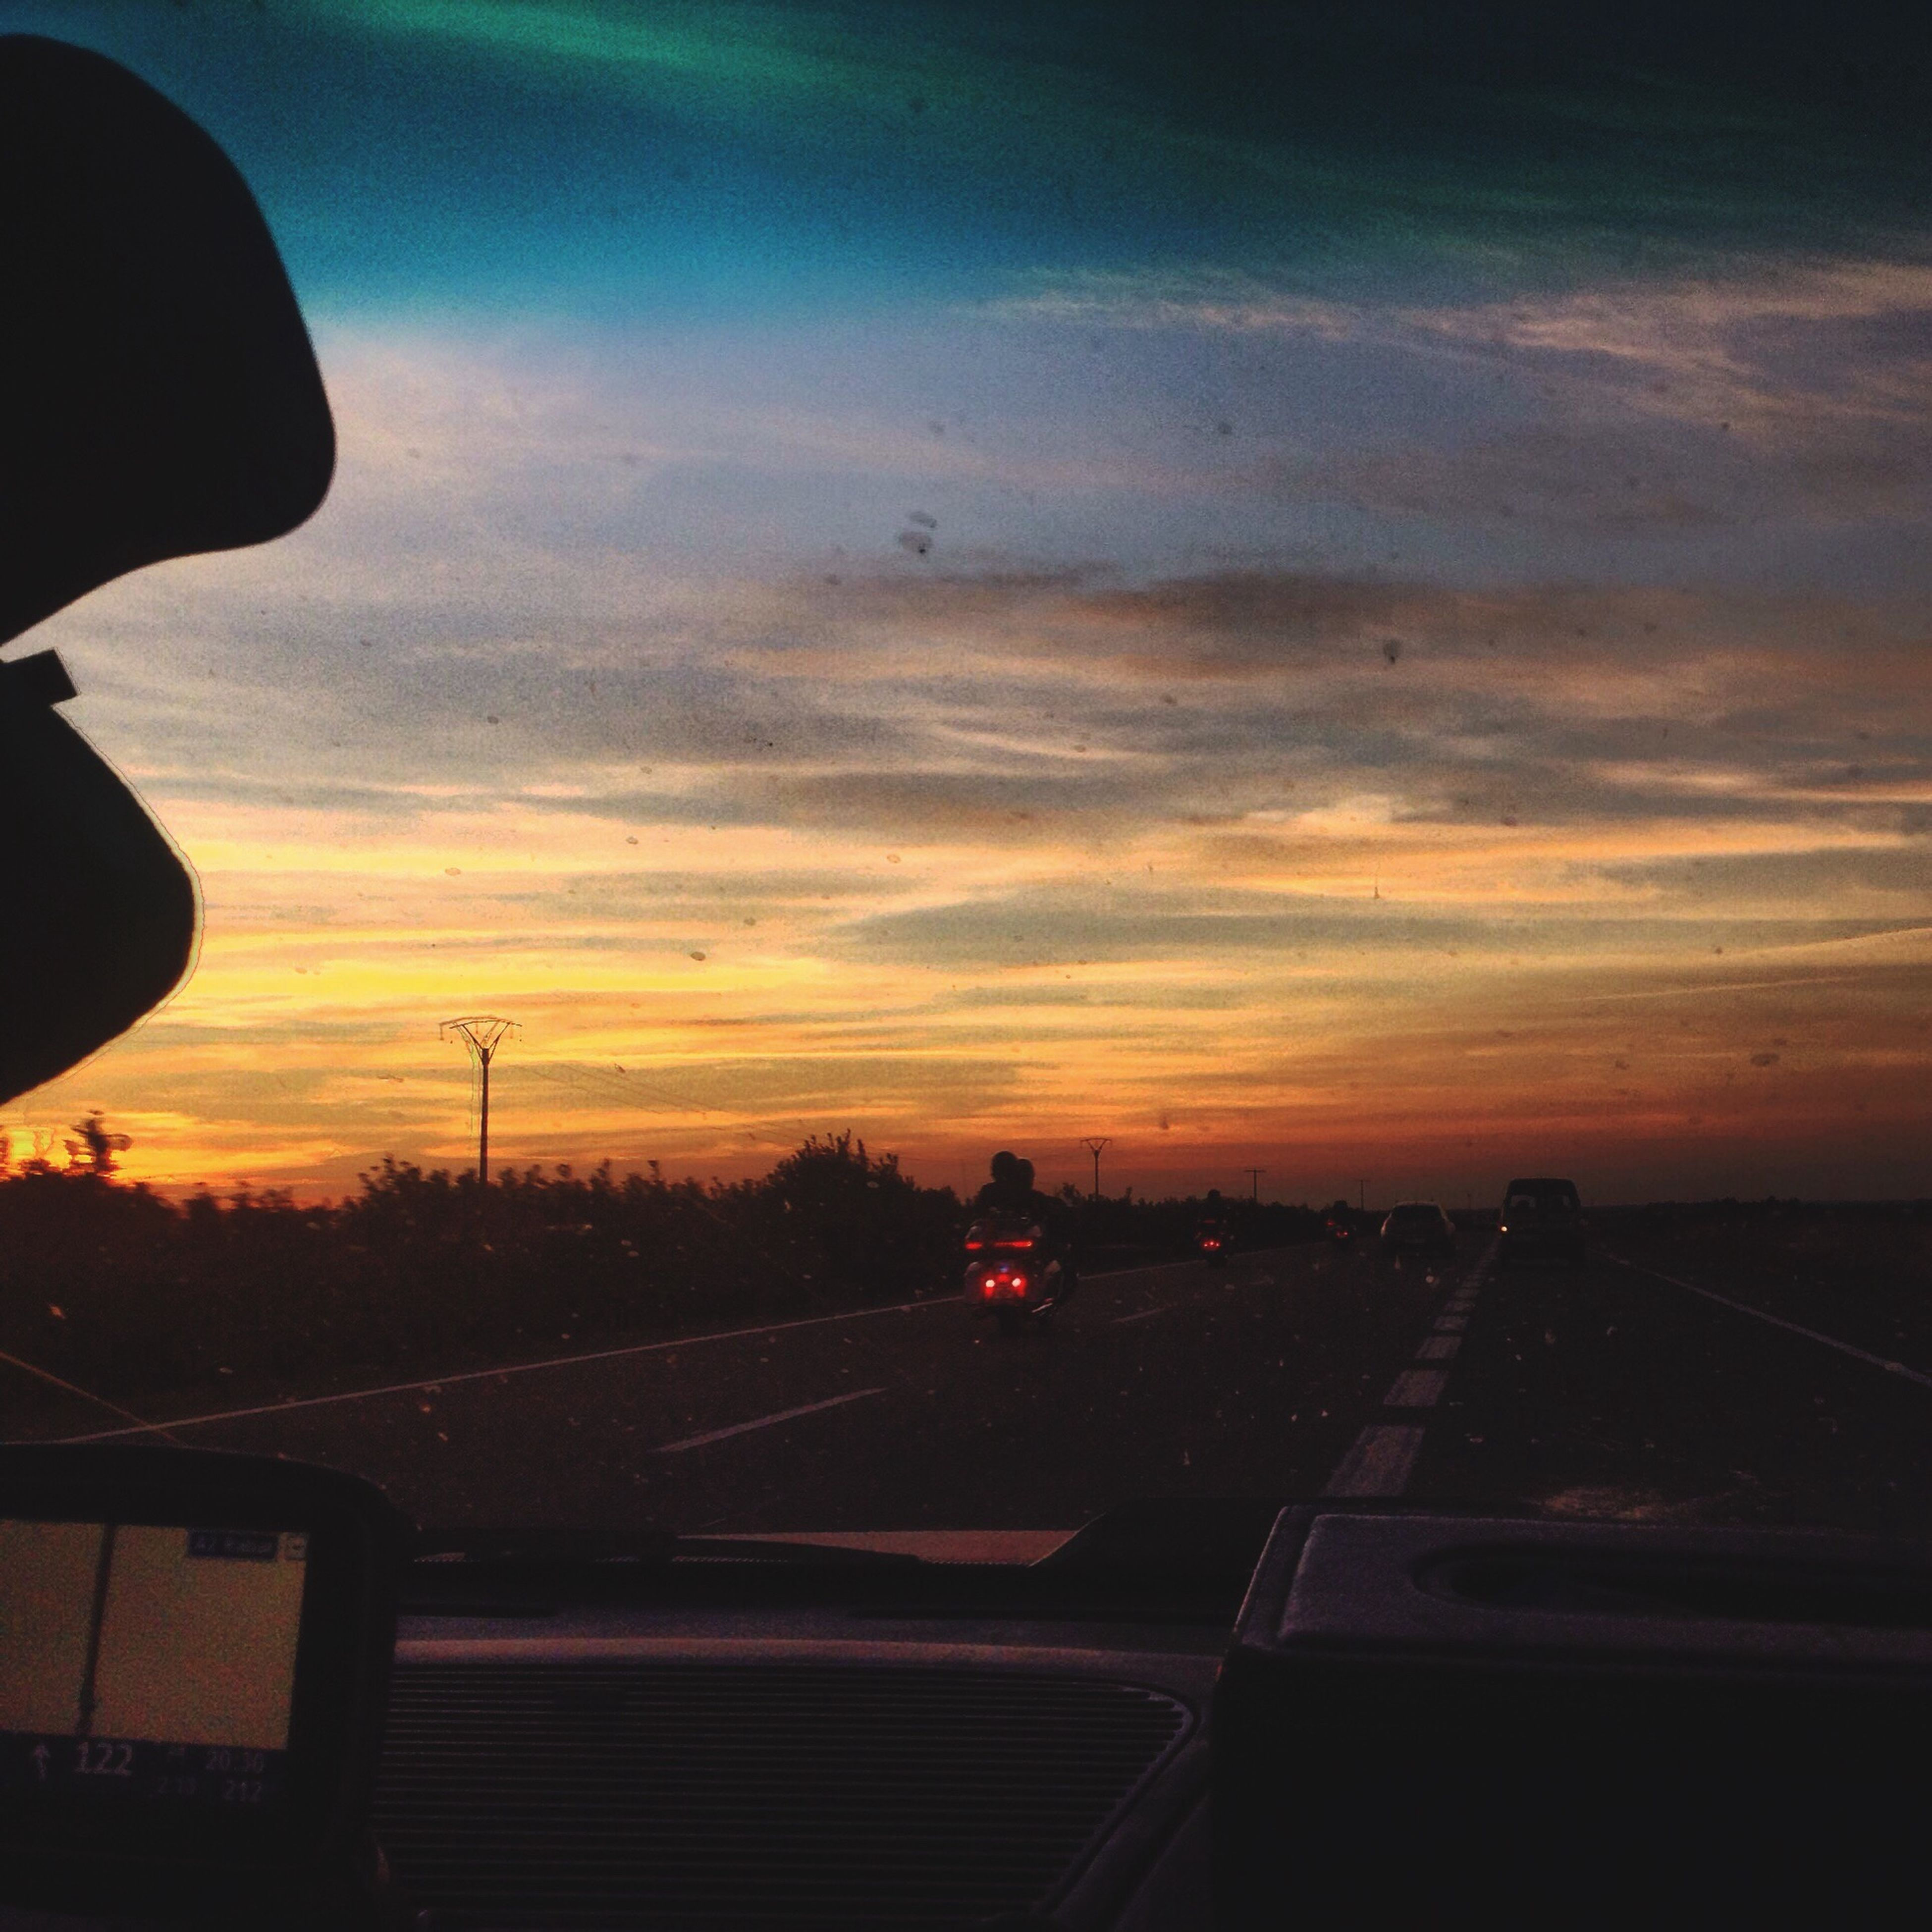 Highway E34 Bmw Harleydavidson Sunset Travel Destinations Outdoors Roadtocasablanca